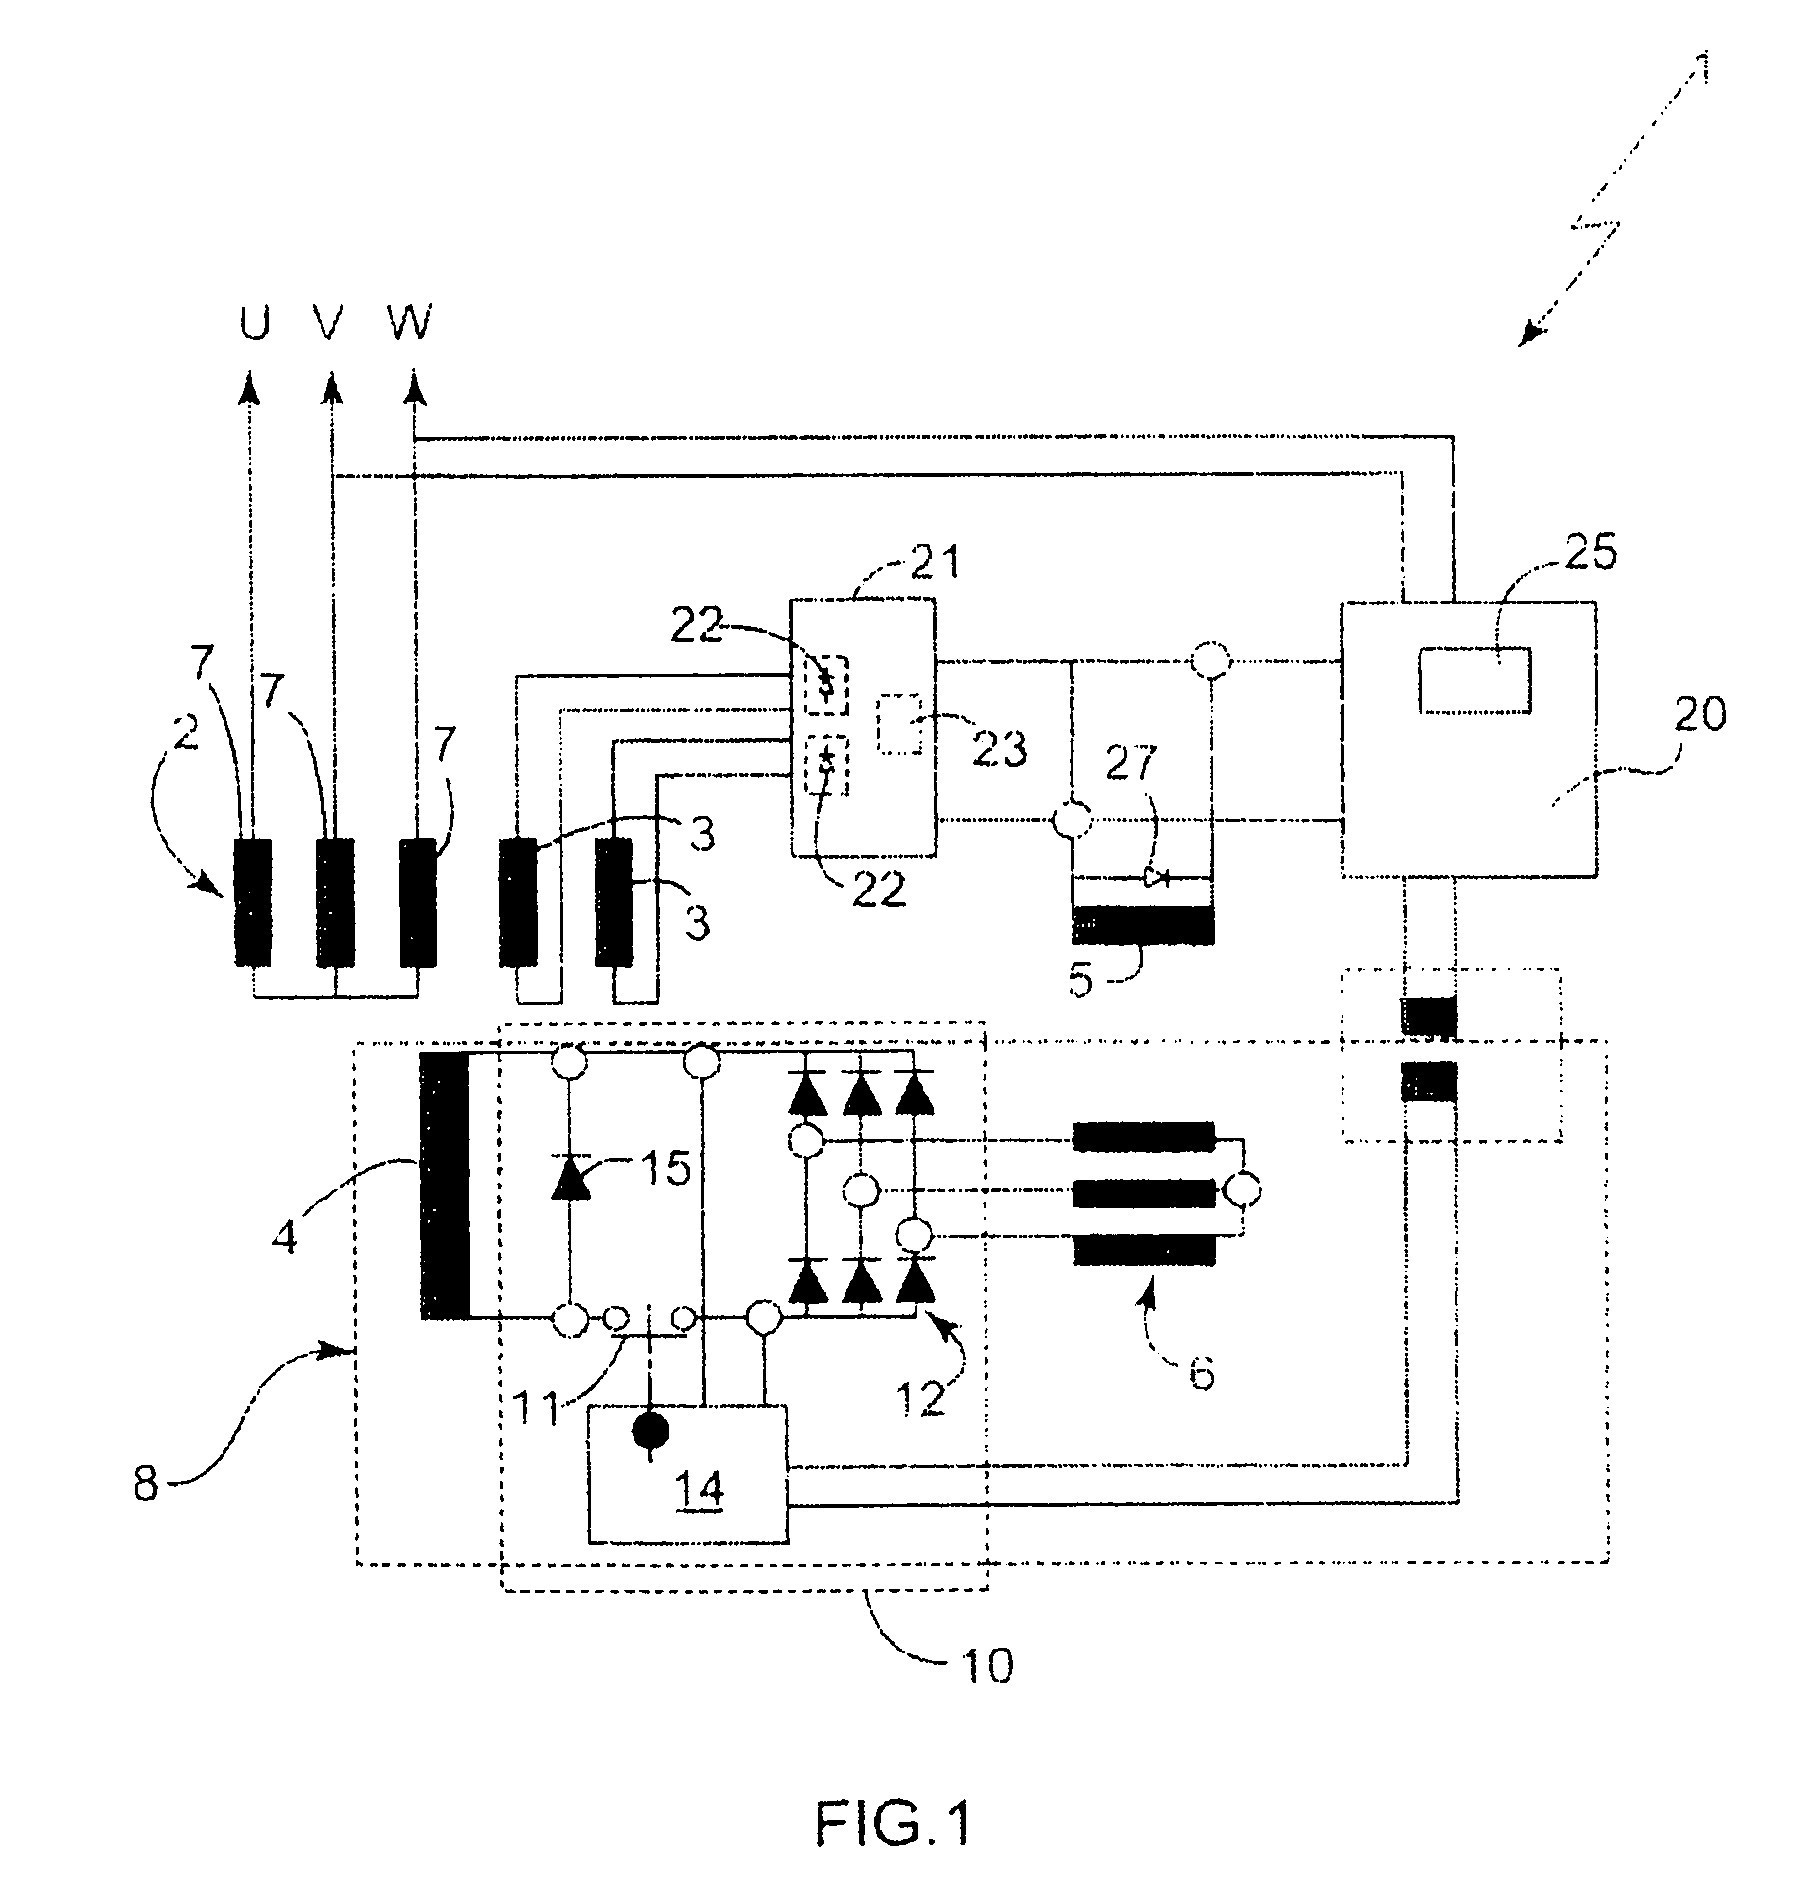 Sx460 Voltage Regulator Wiring Diagram from i0.wp.com